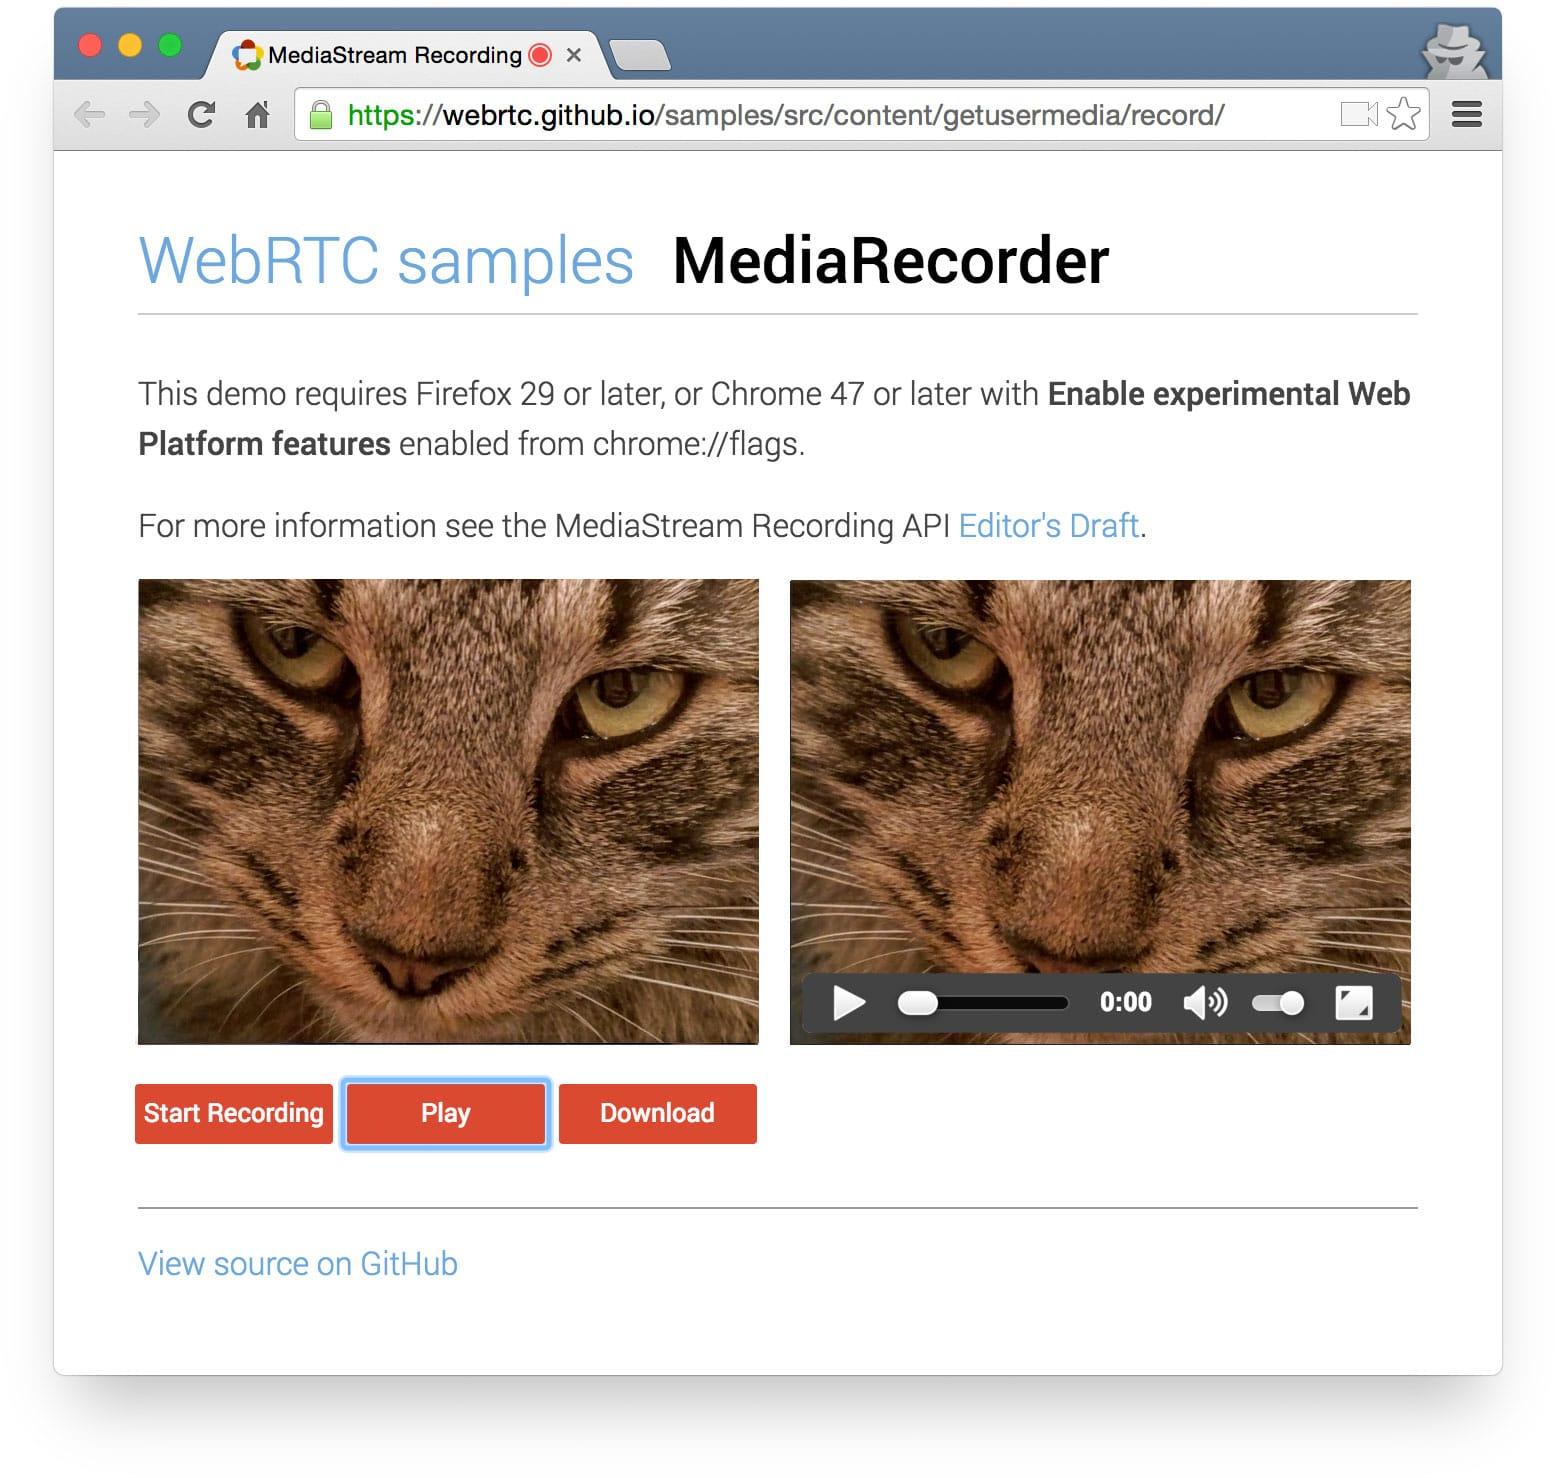 Screenshot of MediaRecorder demo on the WebRTC GitHub samples repo